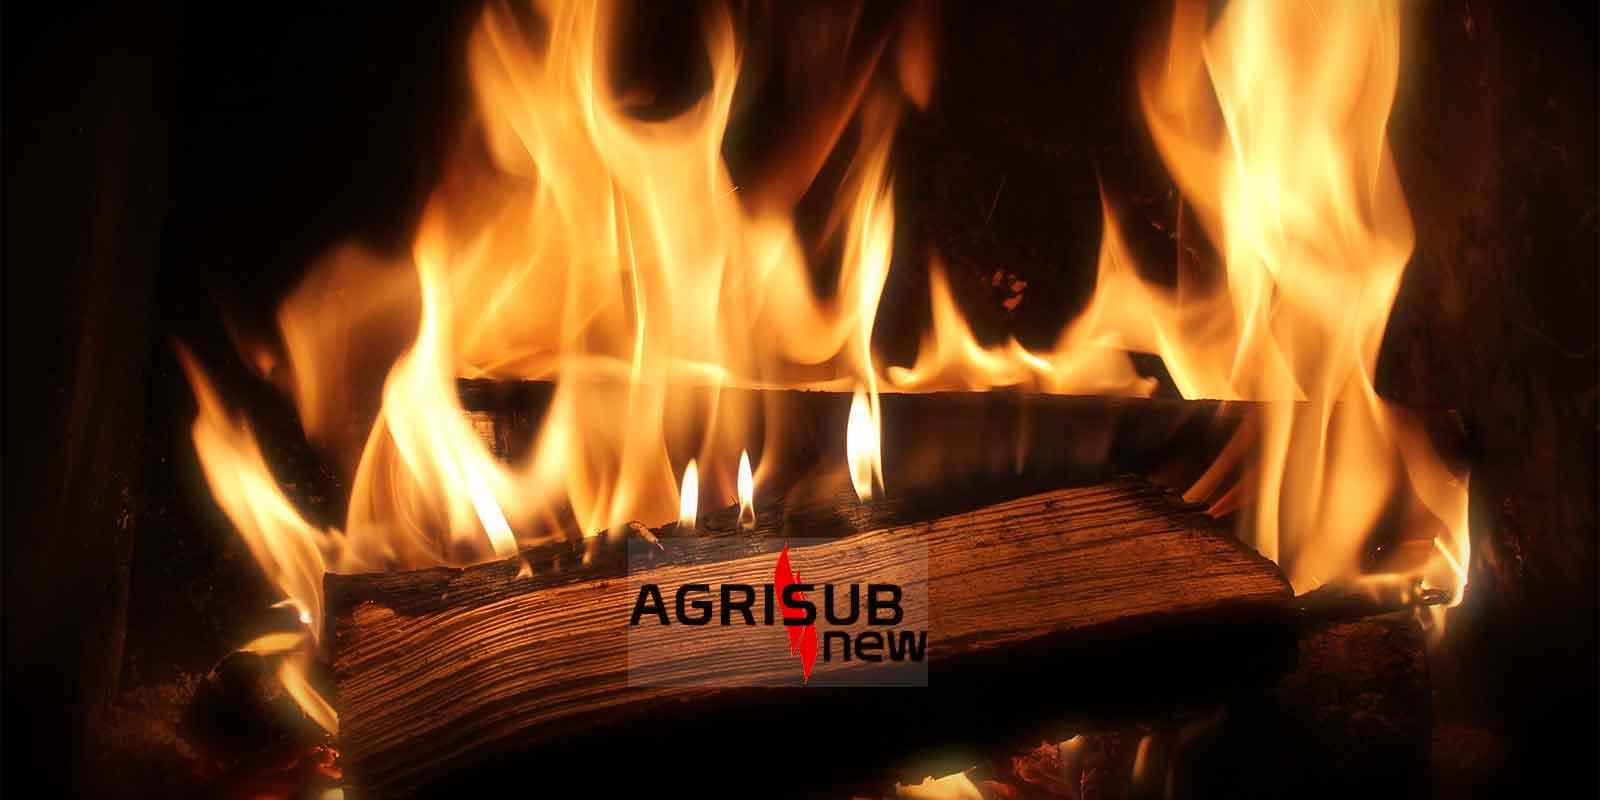 Agrisub New, caldaie, termostufe a pellet e legna, camini e termocamini, risparmio energetico, conto termico.